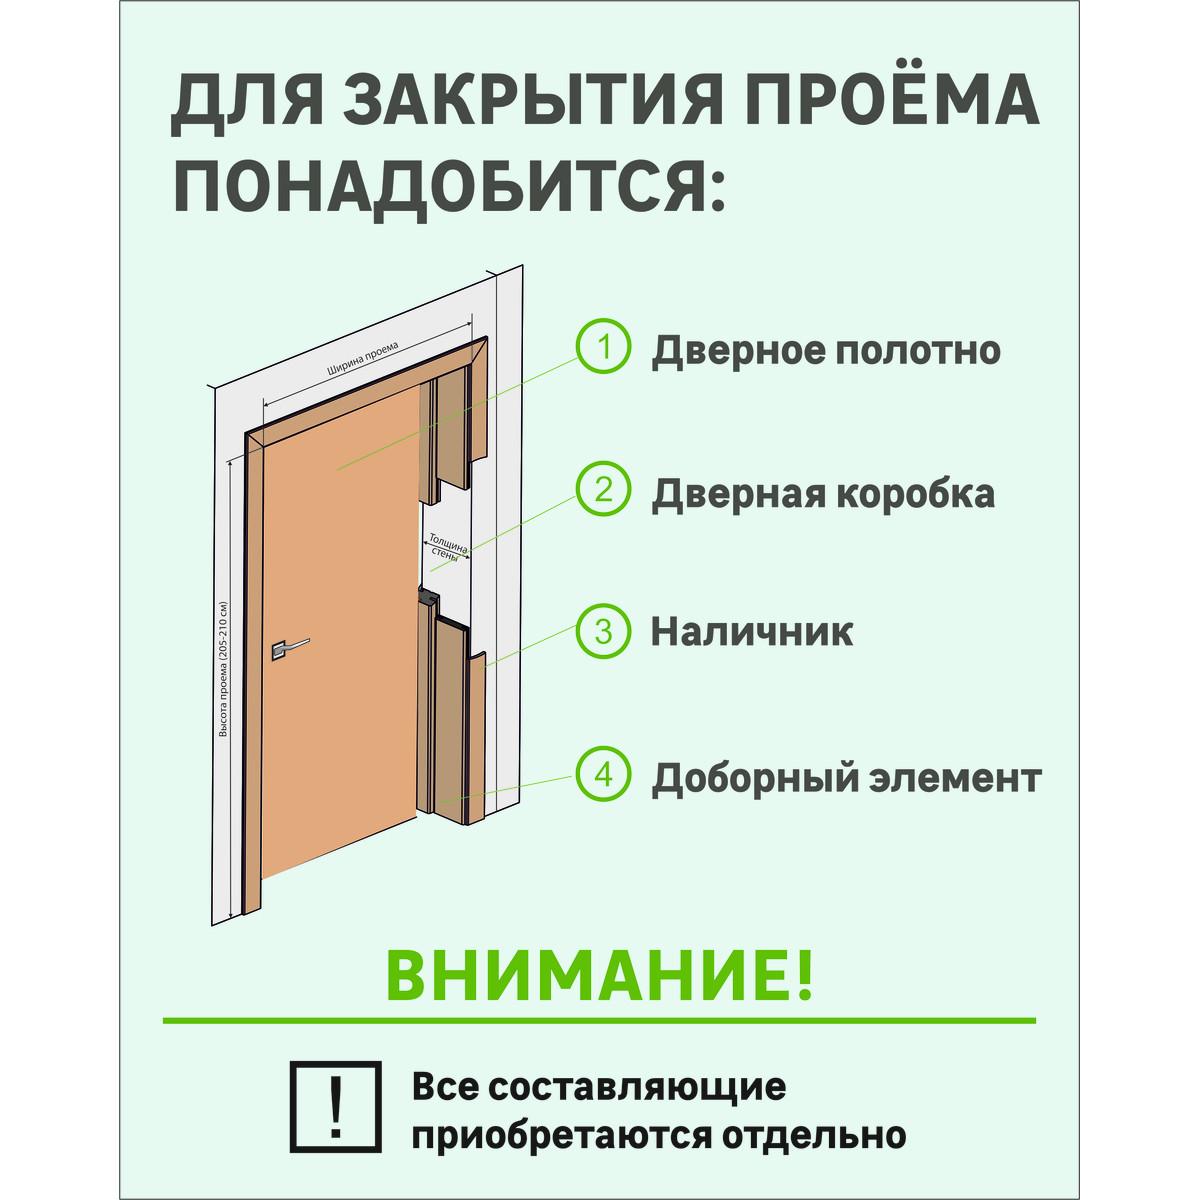 Дверь Межкомнатная Остеклённая 819 80x200 Шпон Цвет Дуб Серая Патина